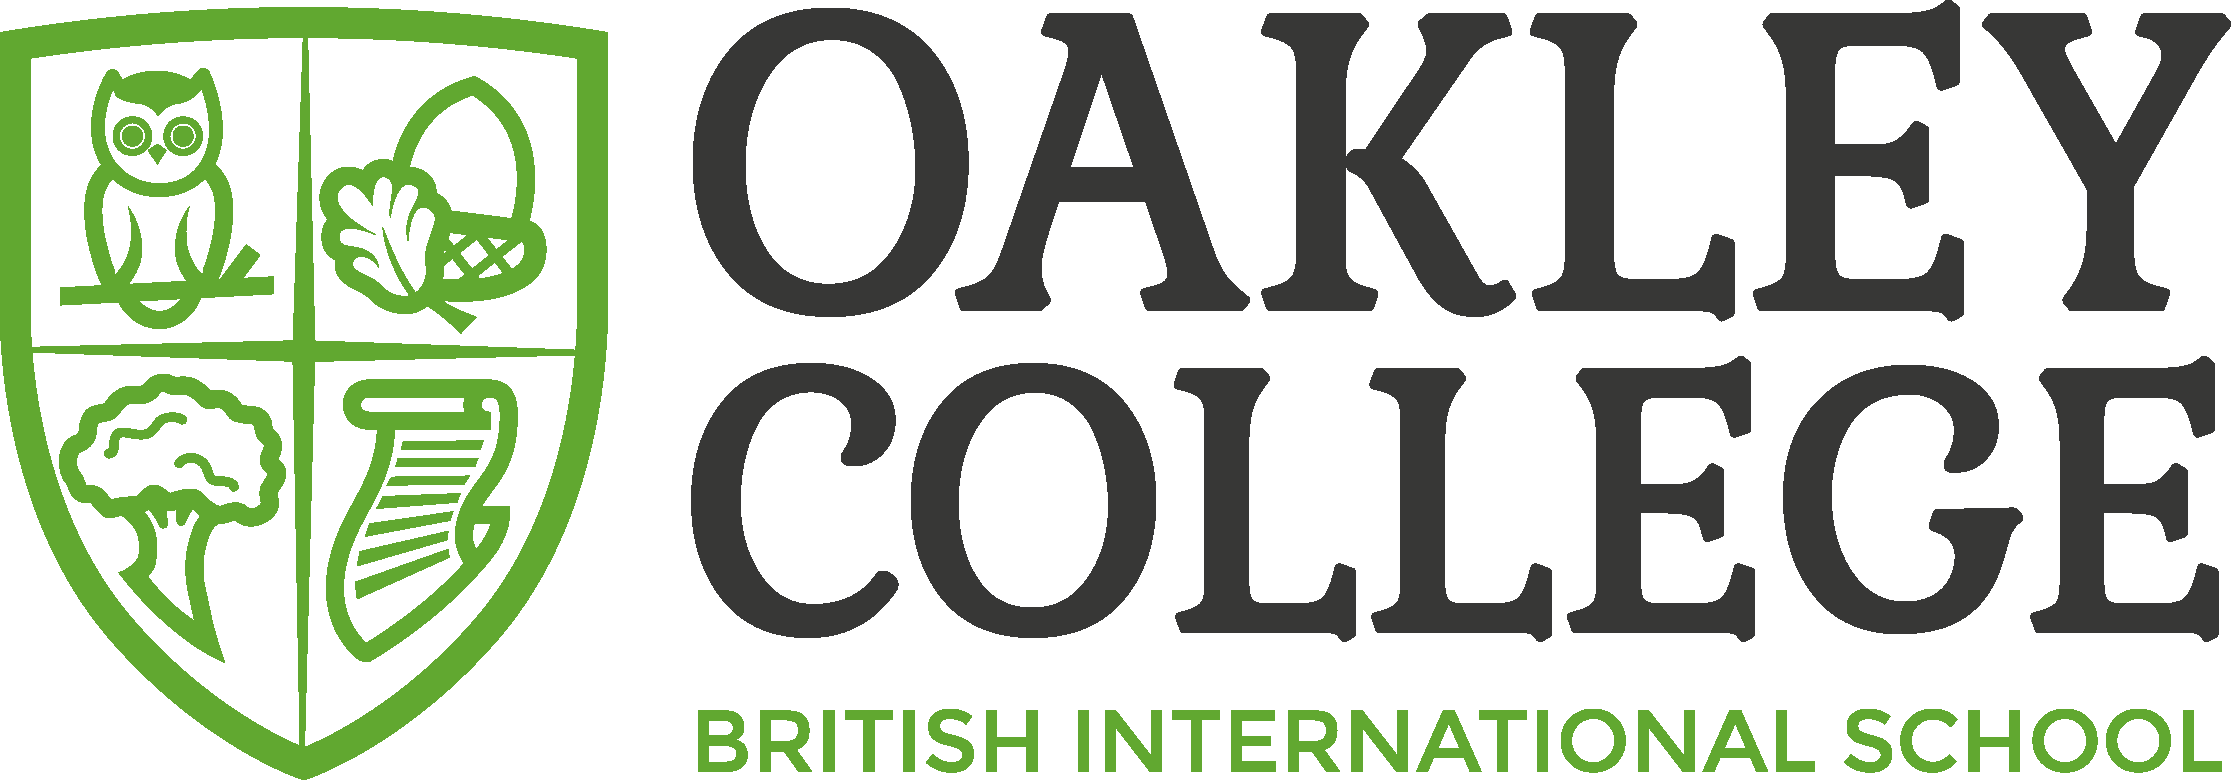 Oakley College Gran Canaria Logo British Schools British College College Logo